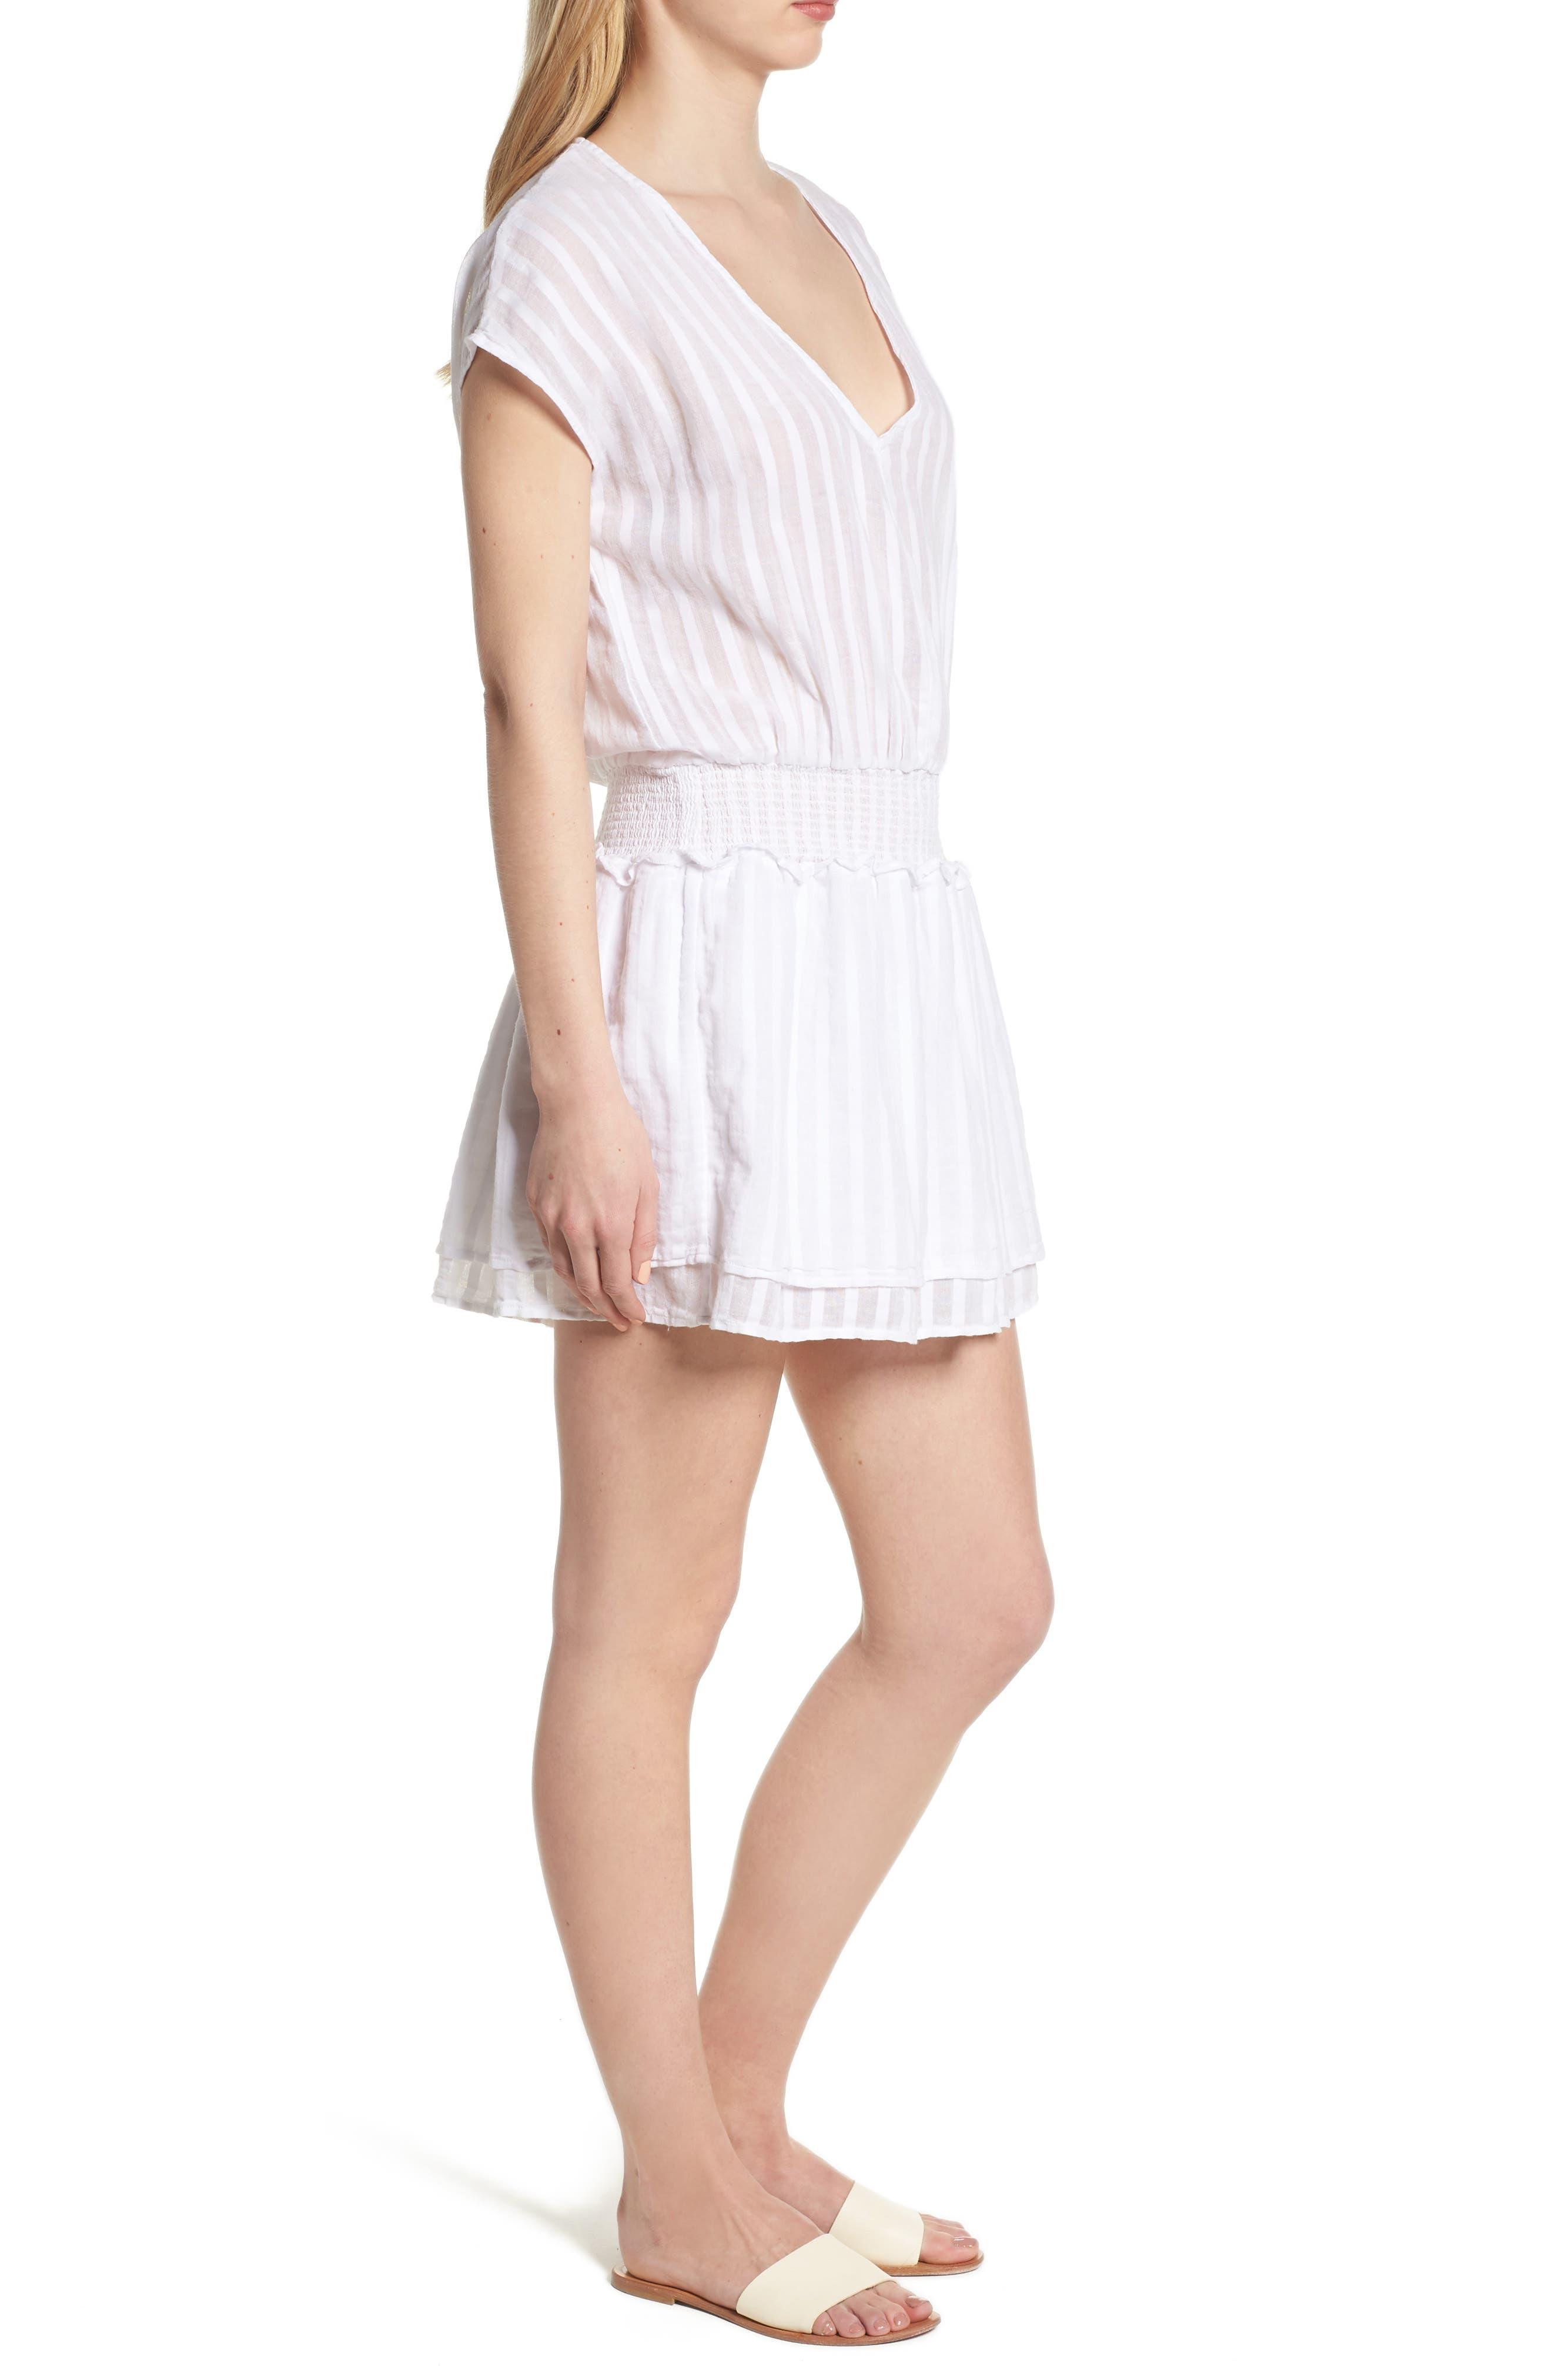 Lucca Blouson Cotton Dress,                             Alternate thumbnail 3, color,                             WHITE SHADOW STRIPE